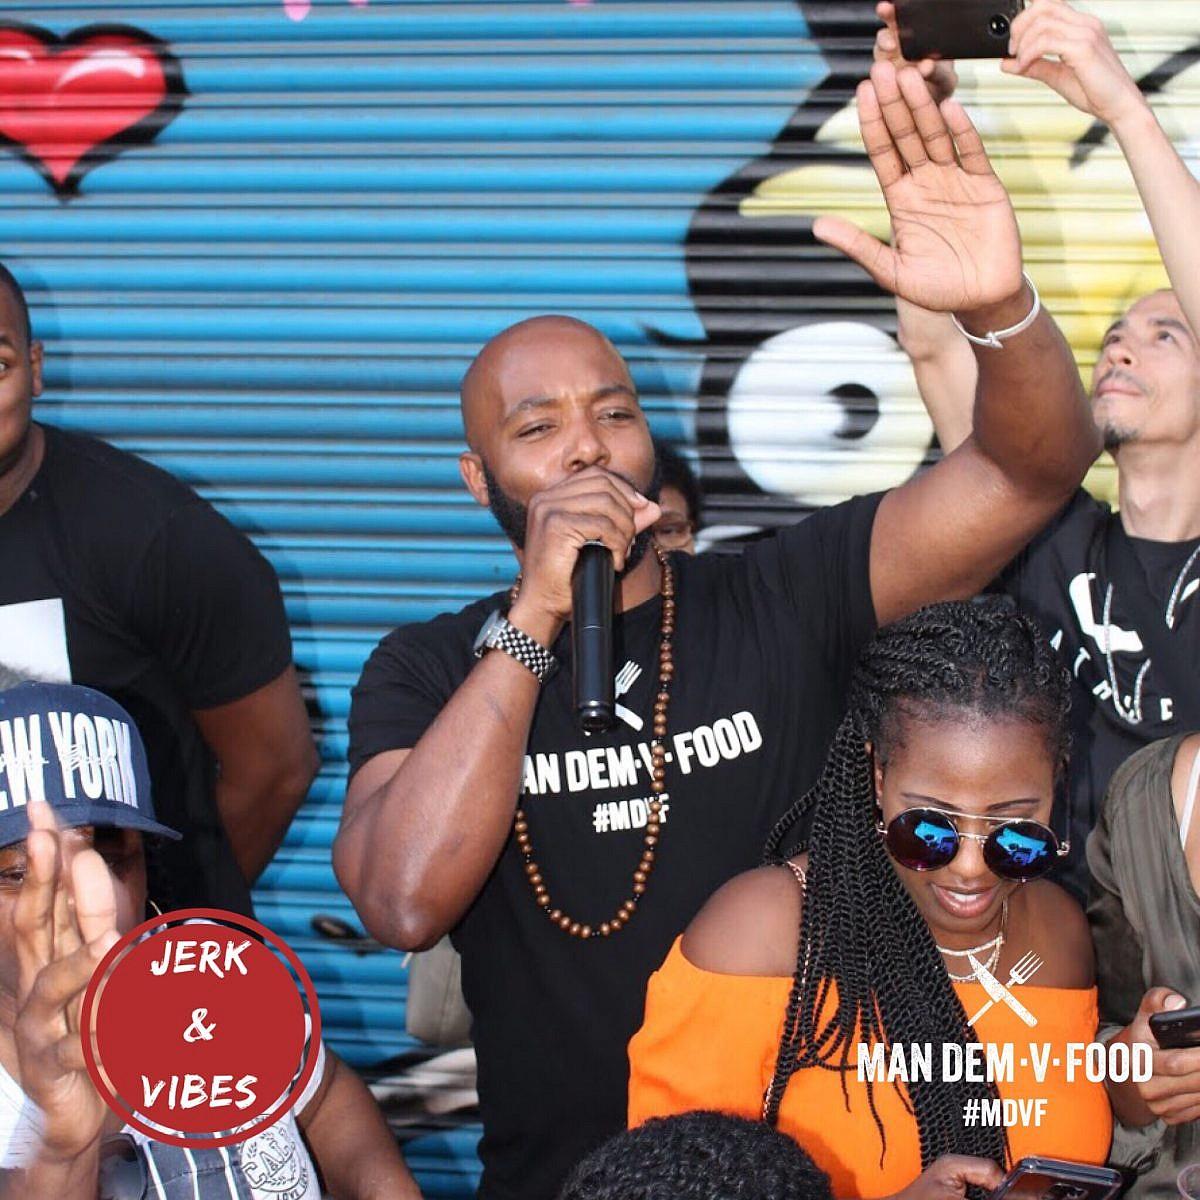 Jerk and Vibes Man Dem V Food Hot Chicken Wing Challenge Event June 2018